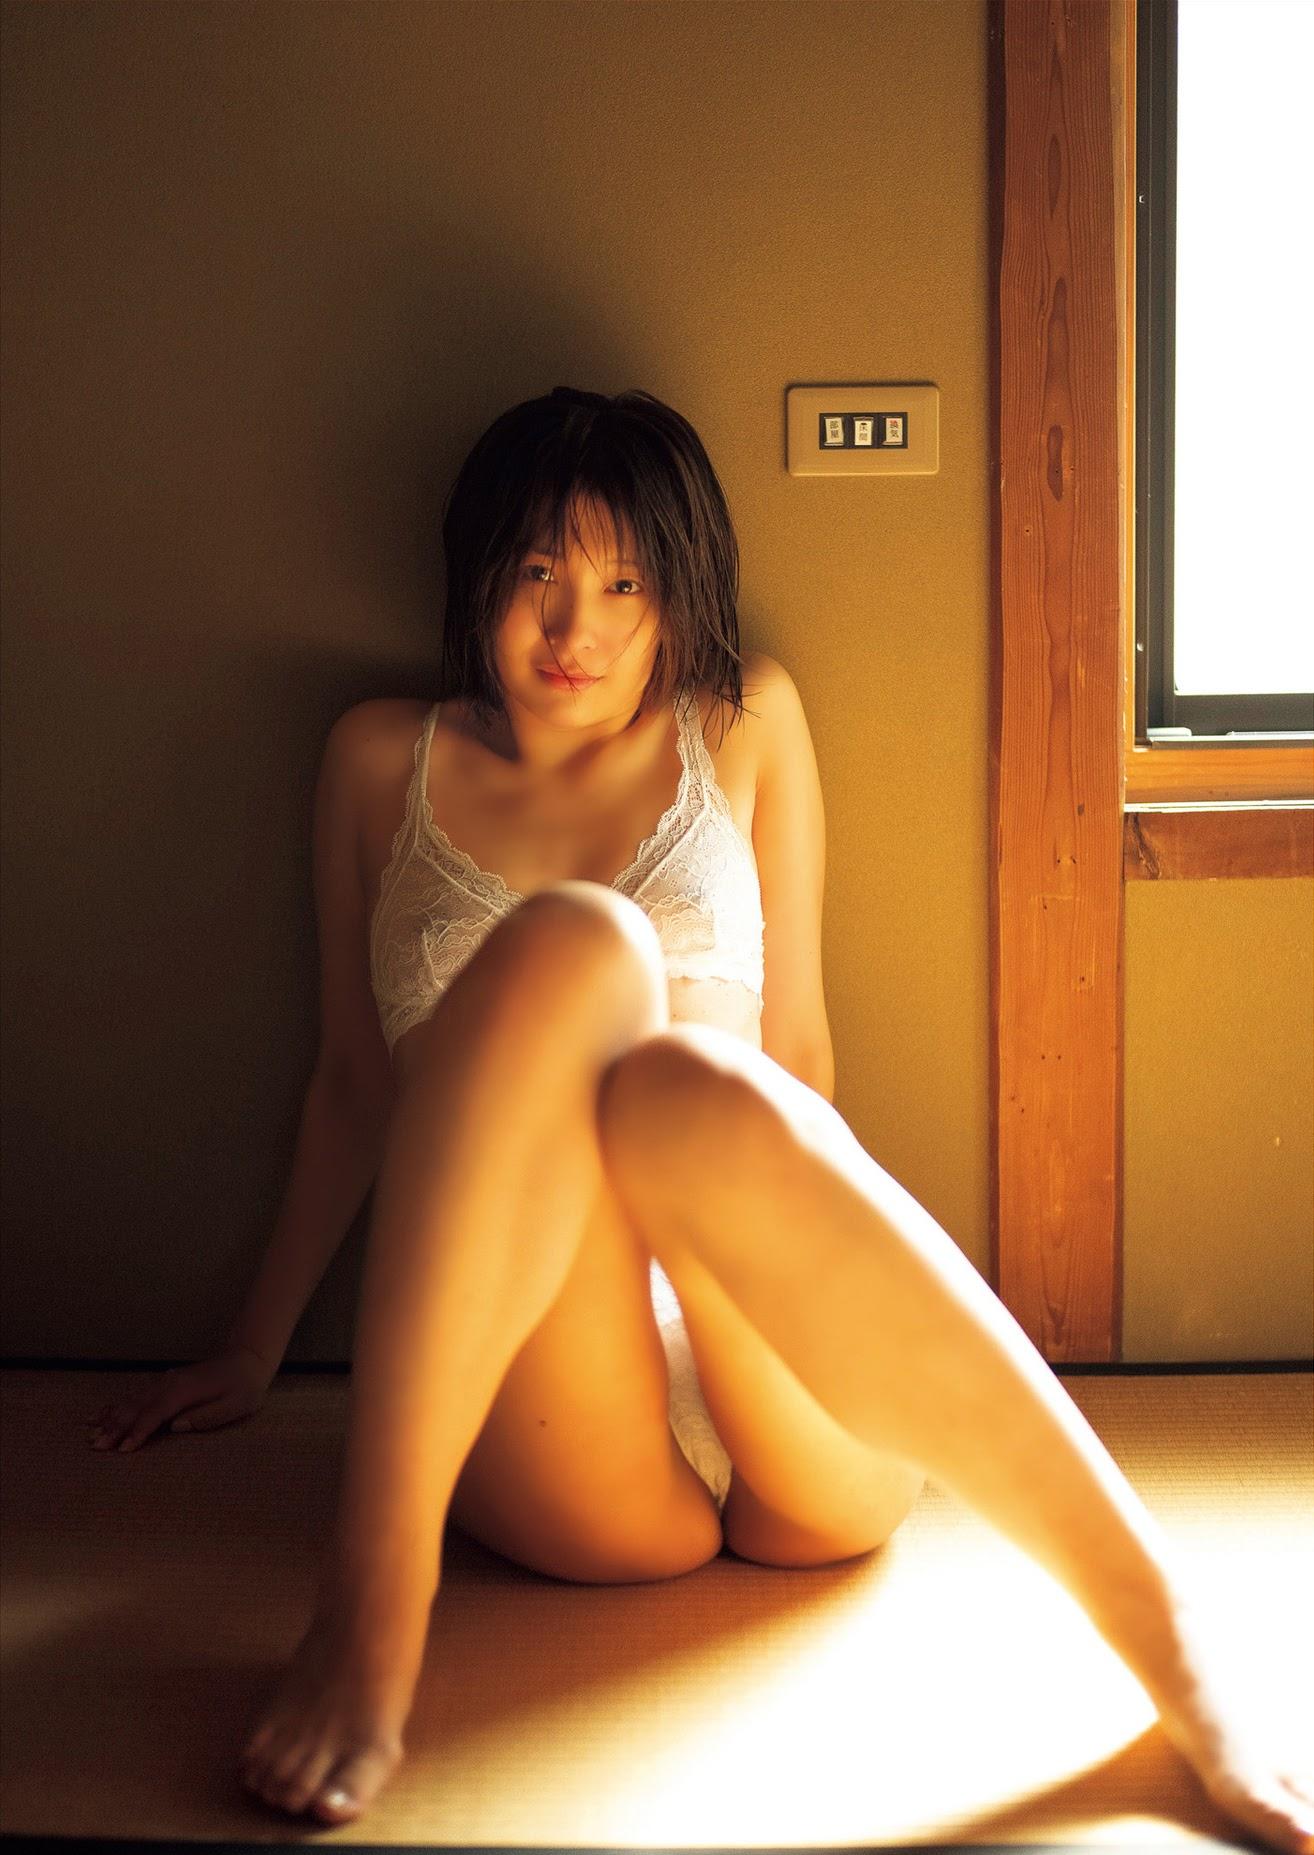 Yamazaki Mami Nude of Love 2020003